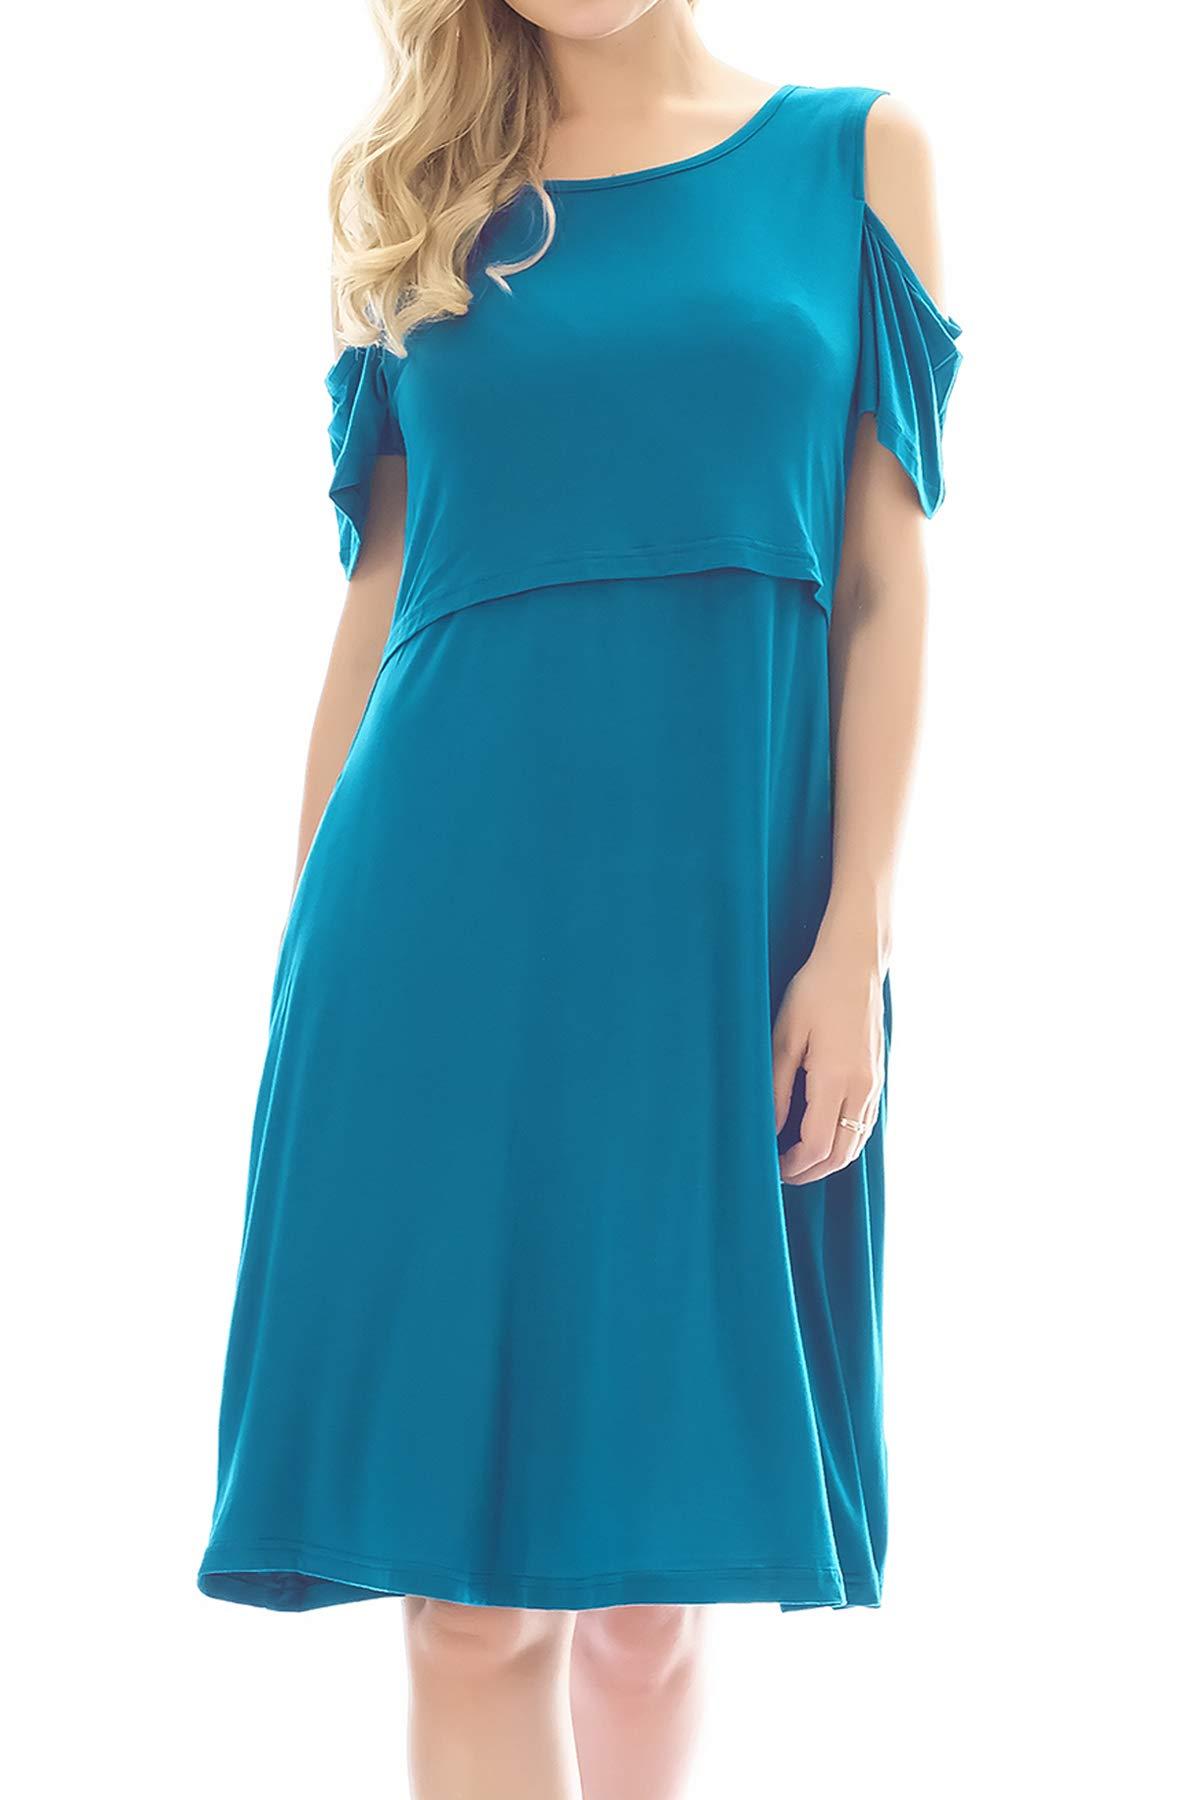 Smallshow Maternity Nursing Breastfeeding Dresses for Women Small Deep Blue